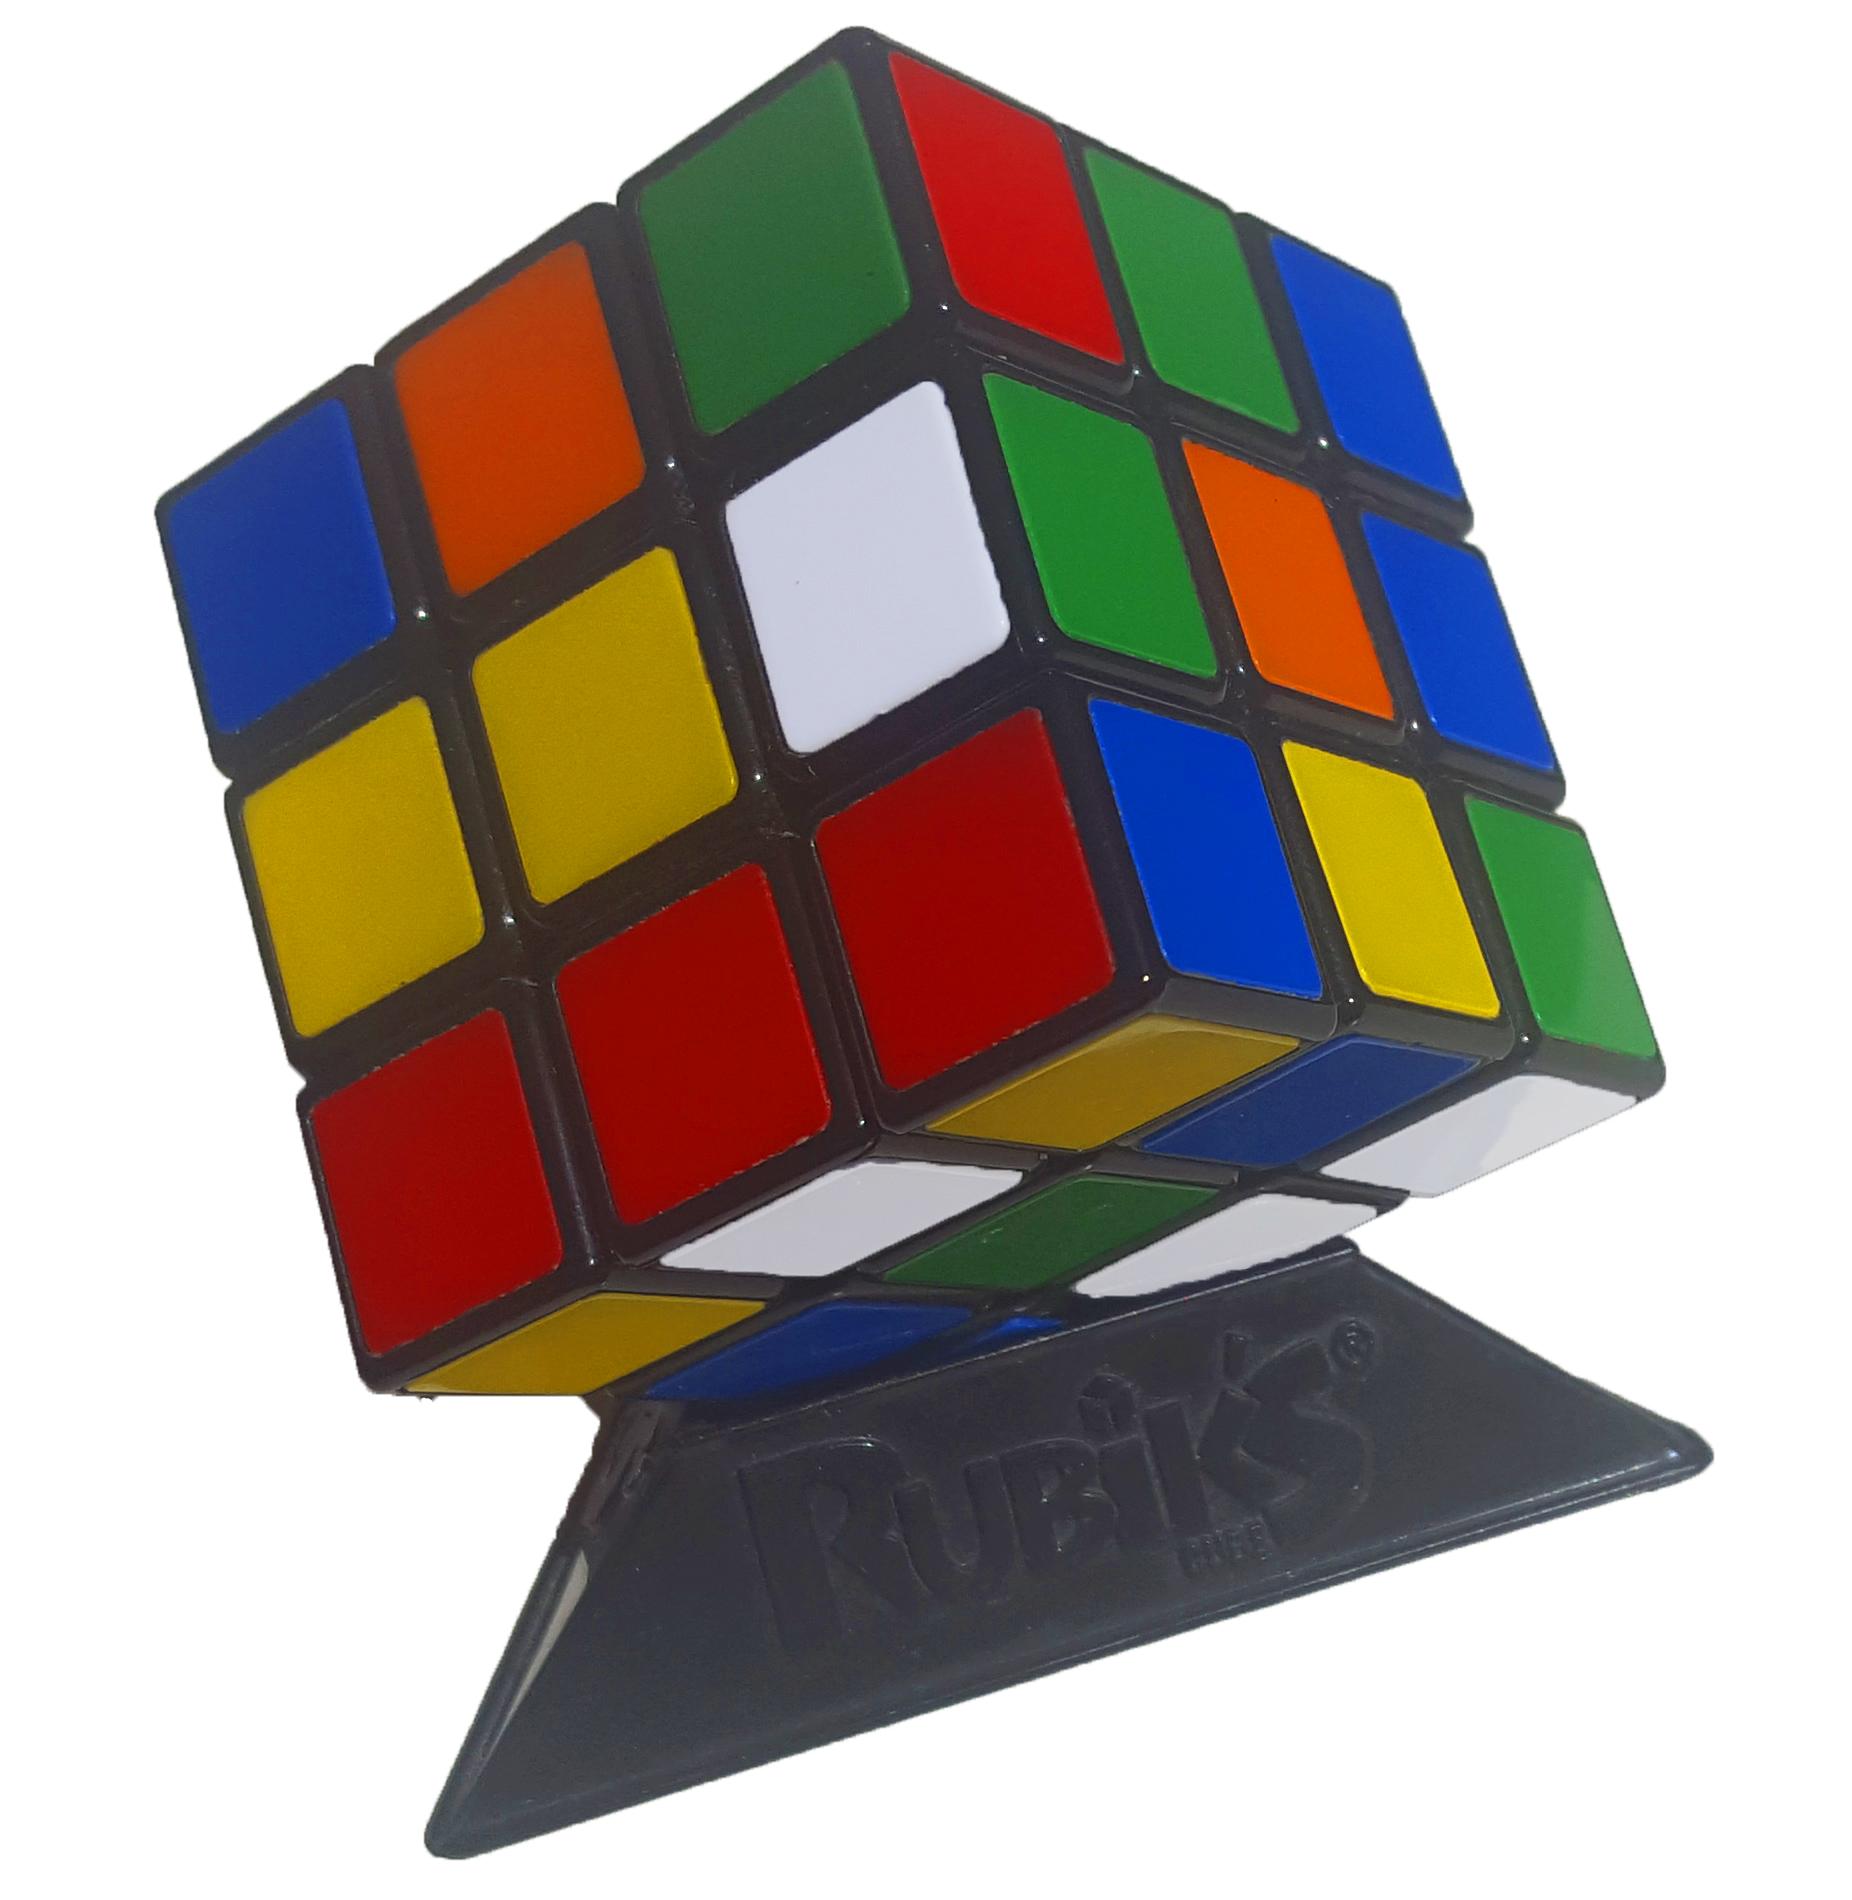 original rubik's cube mit podest